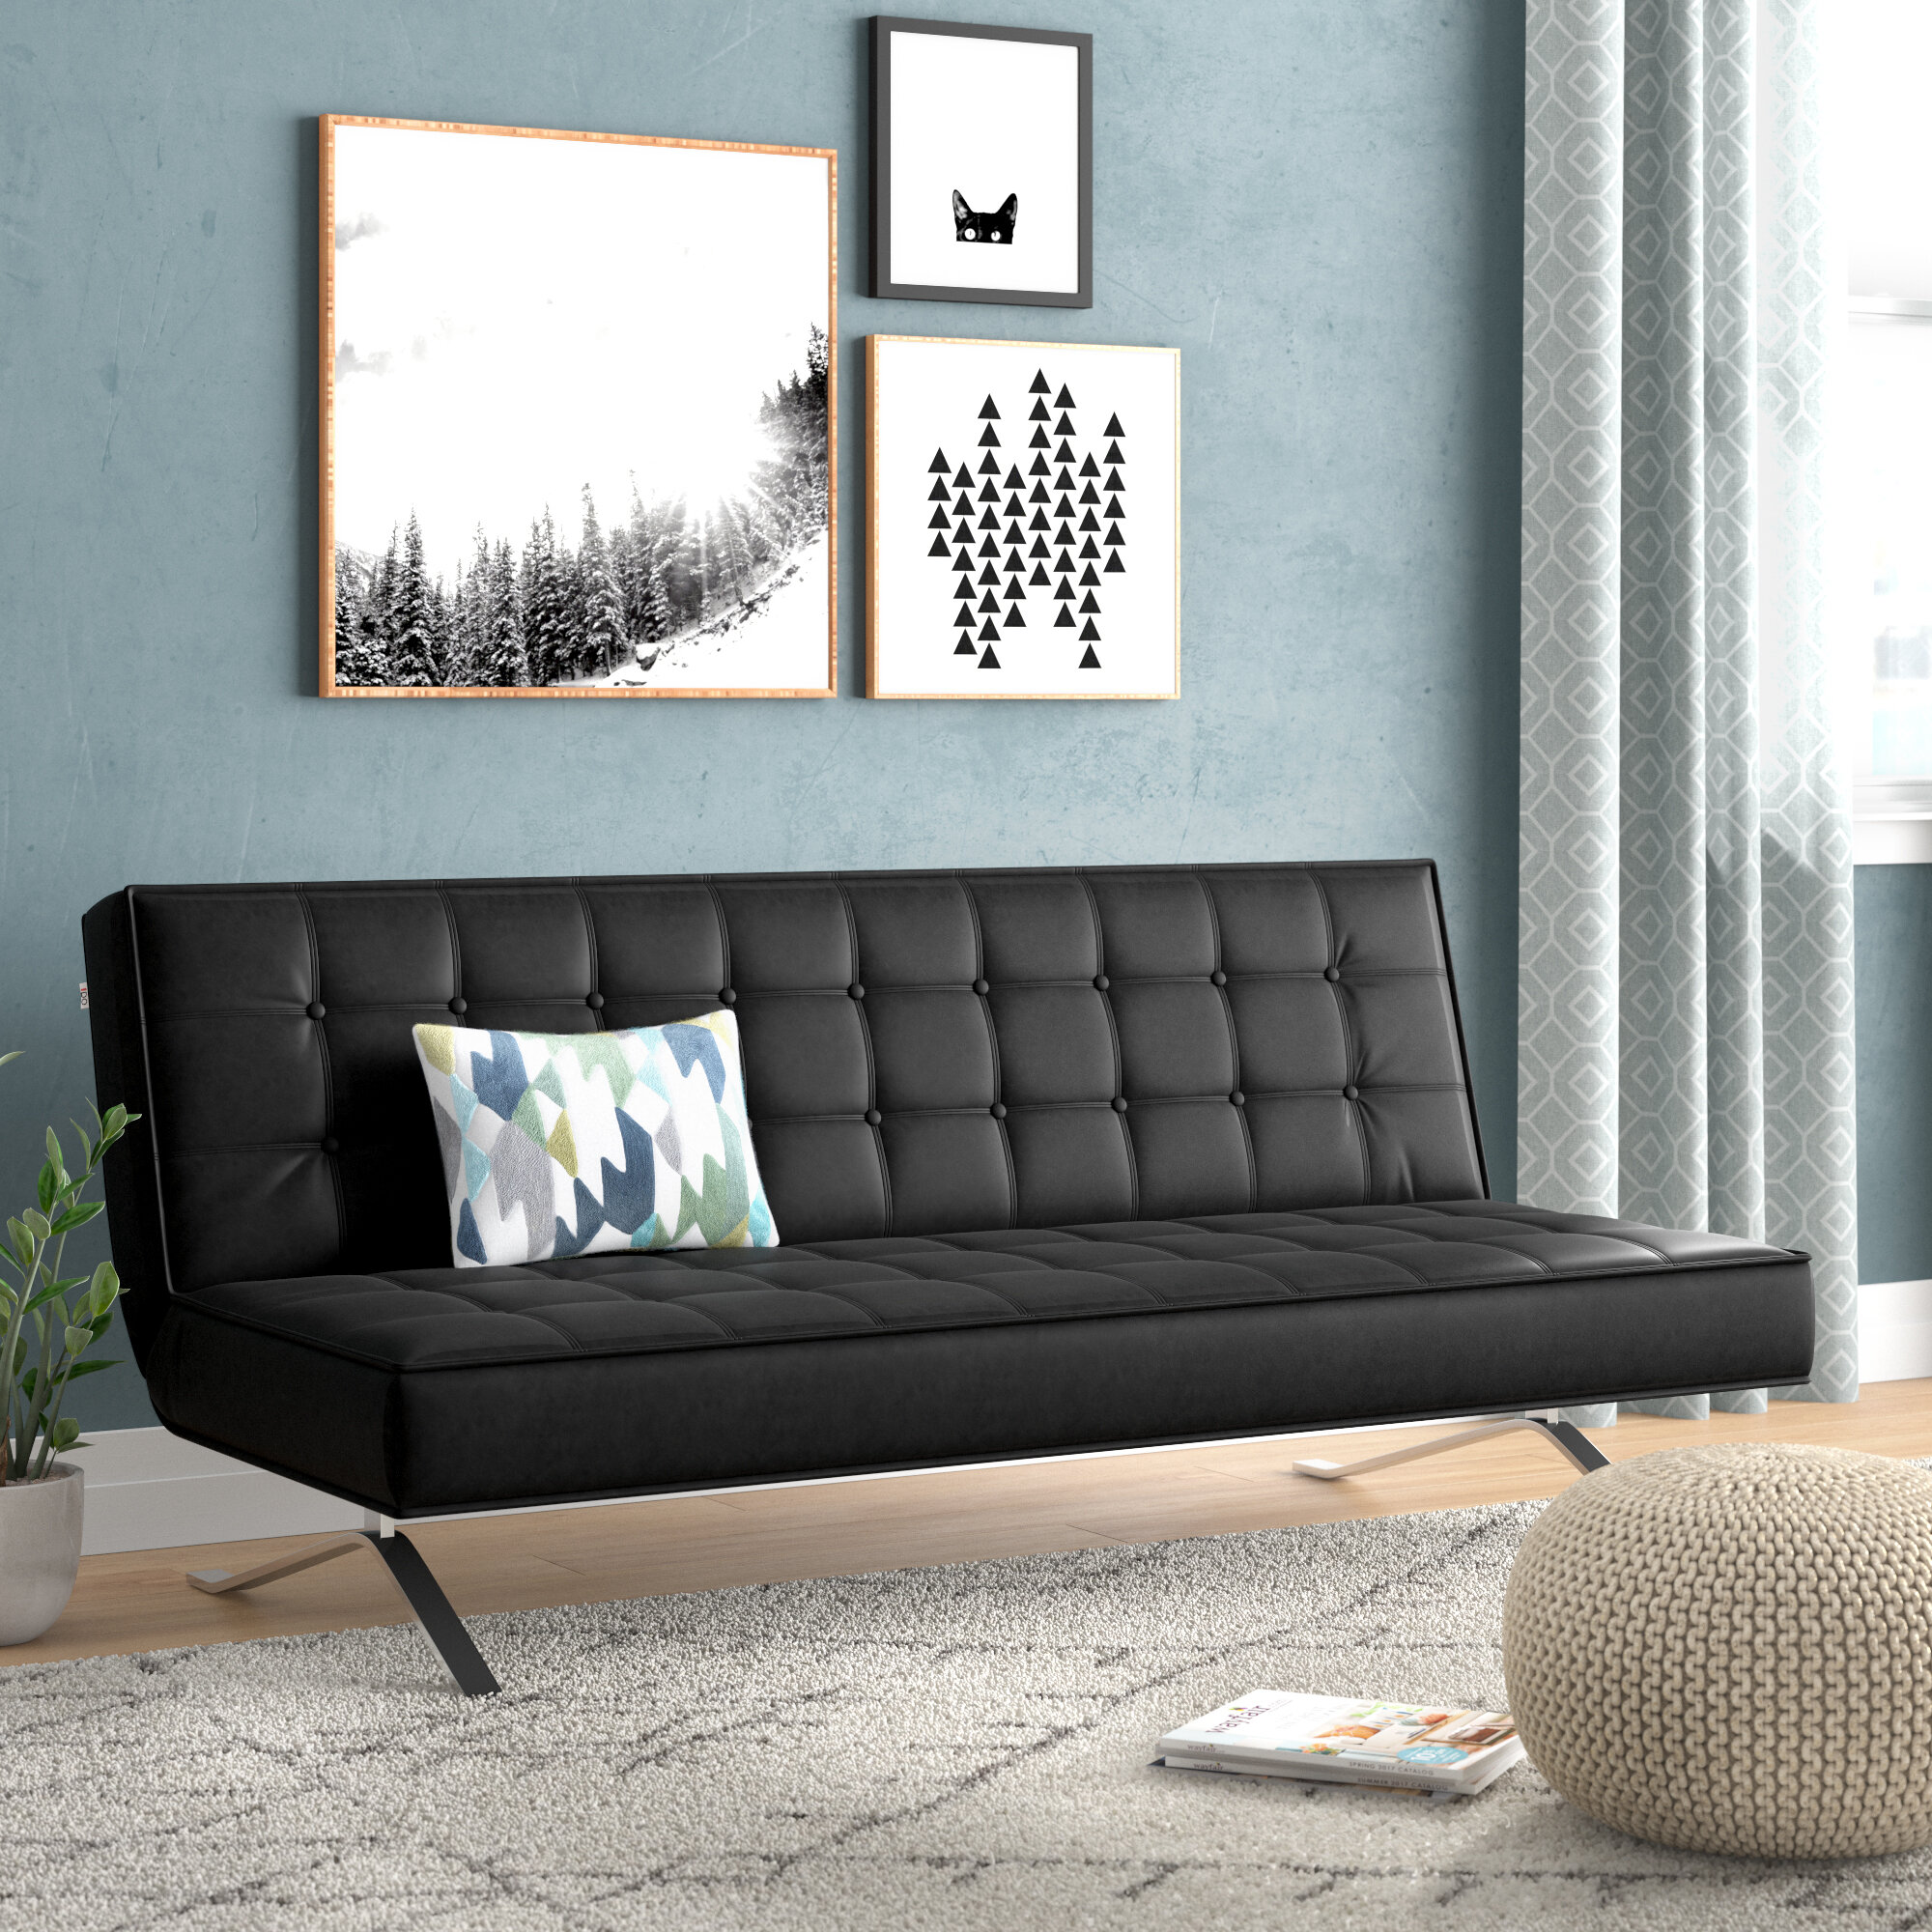 Demelo Full Size Convertible Sofa